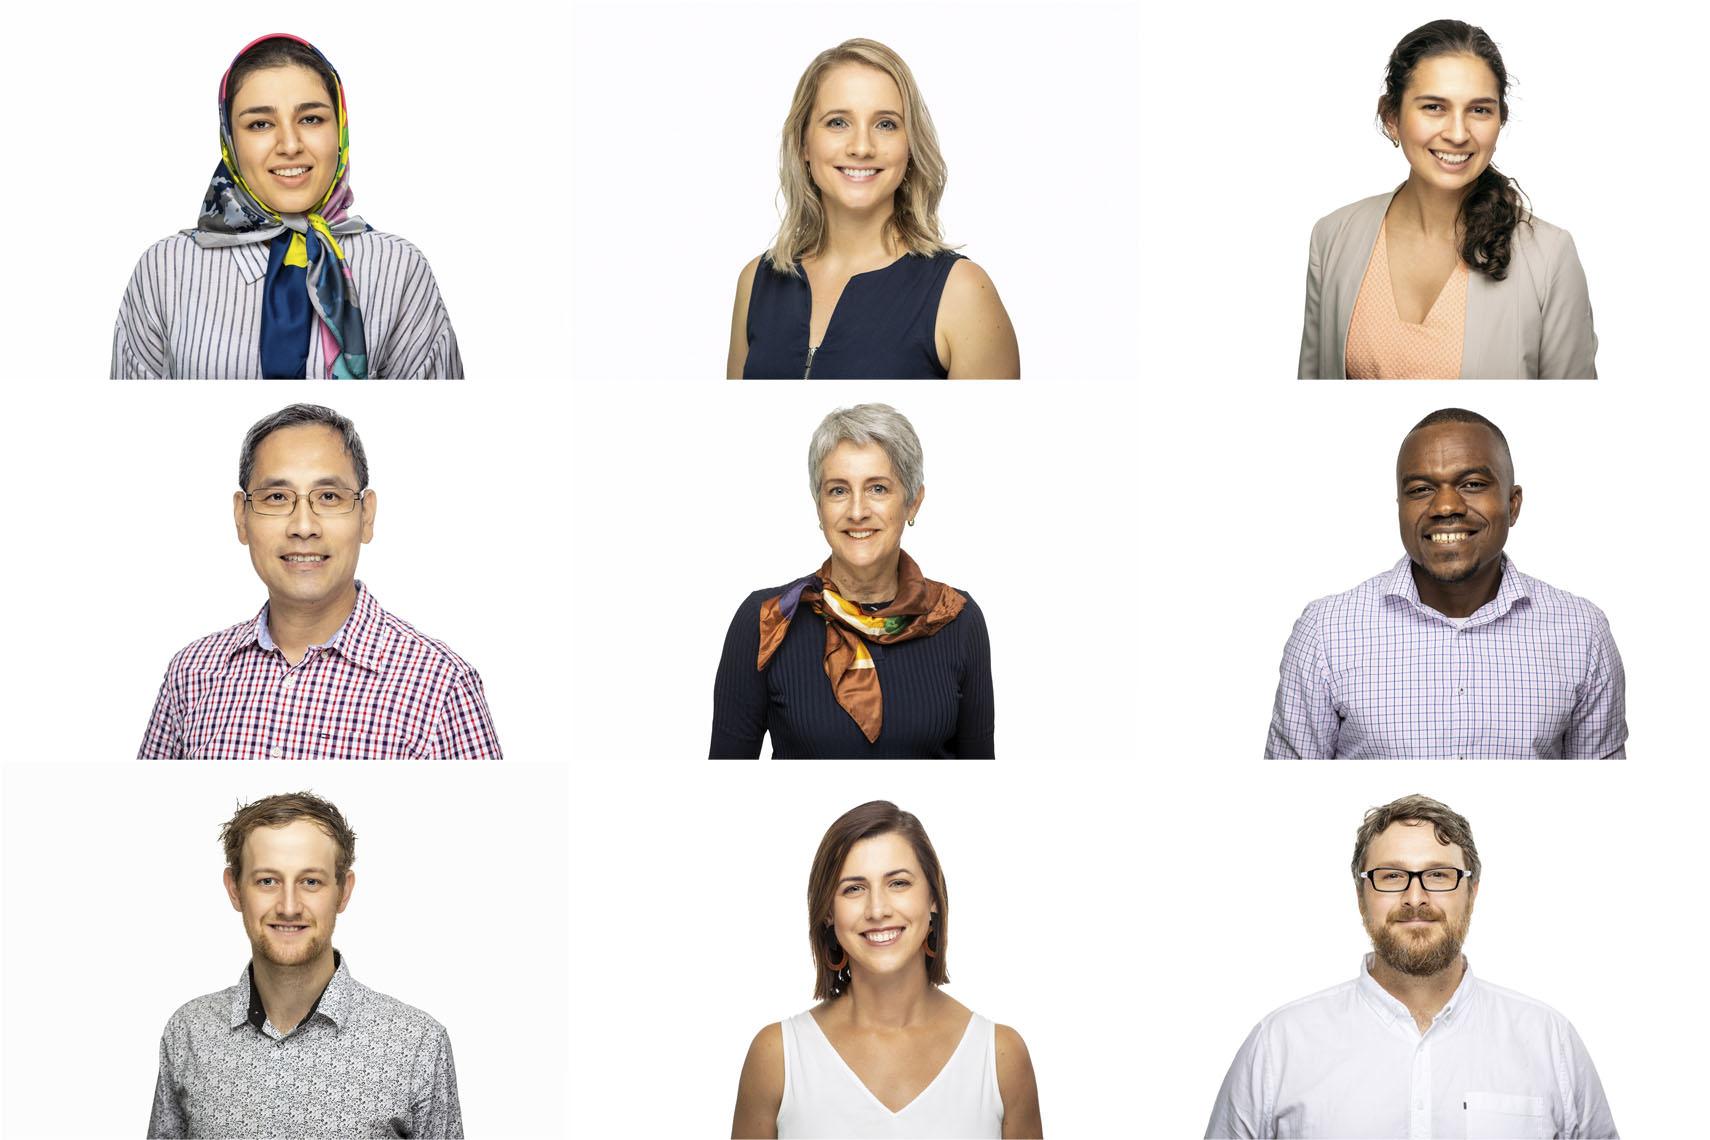 LinkedIn Portraits